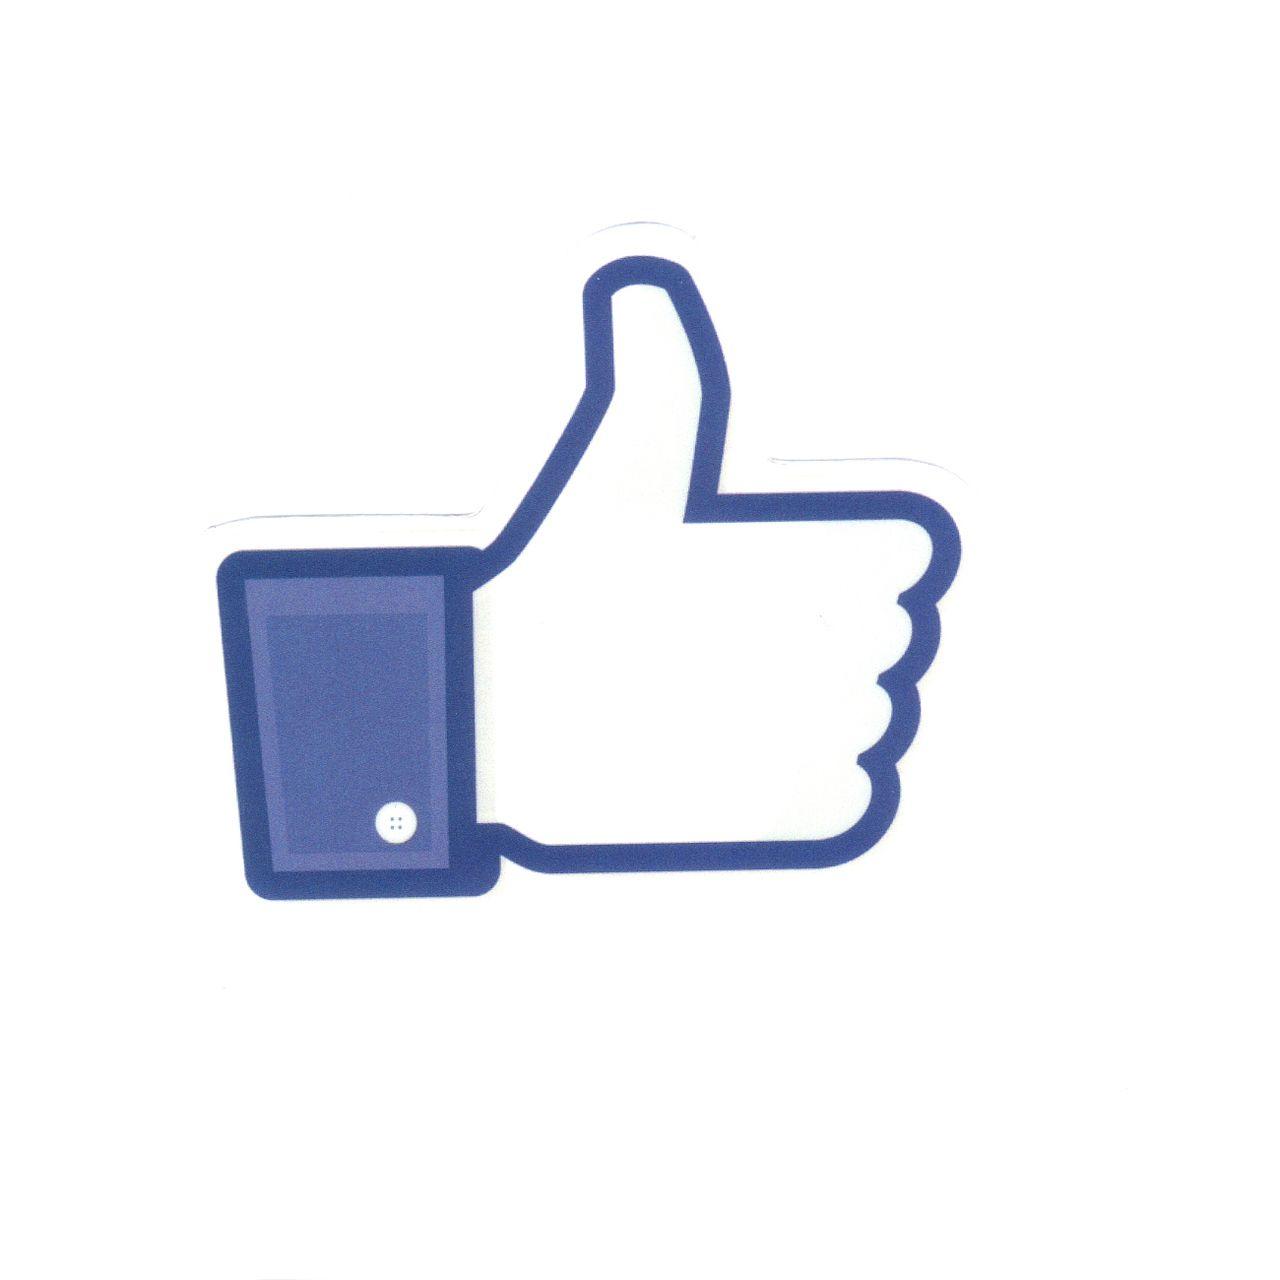 1141 Facebook Like Button Width 6 Cm Decal Sticker